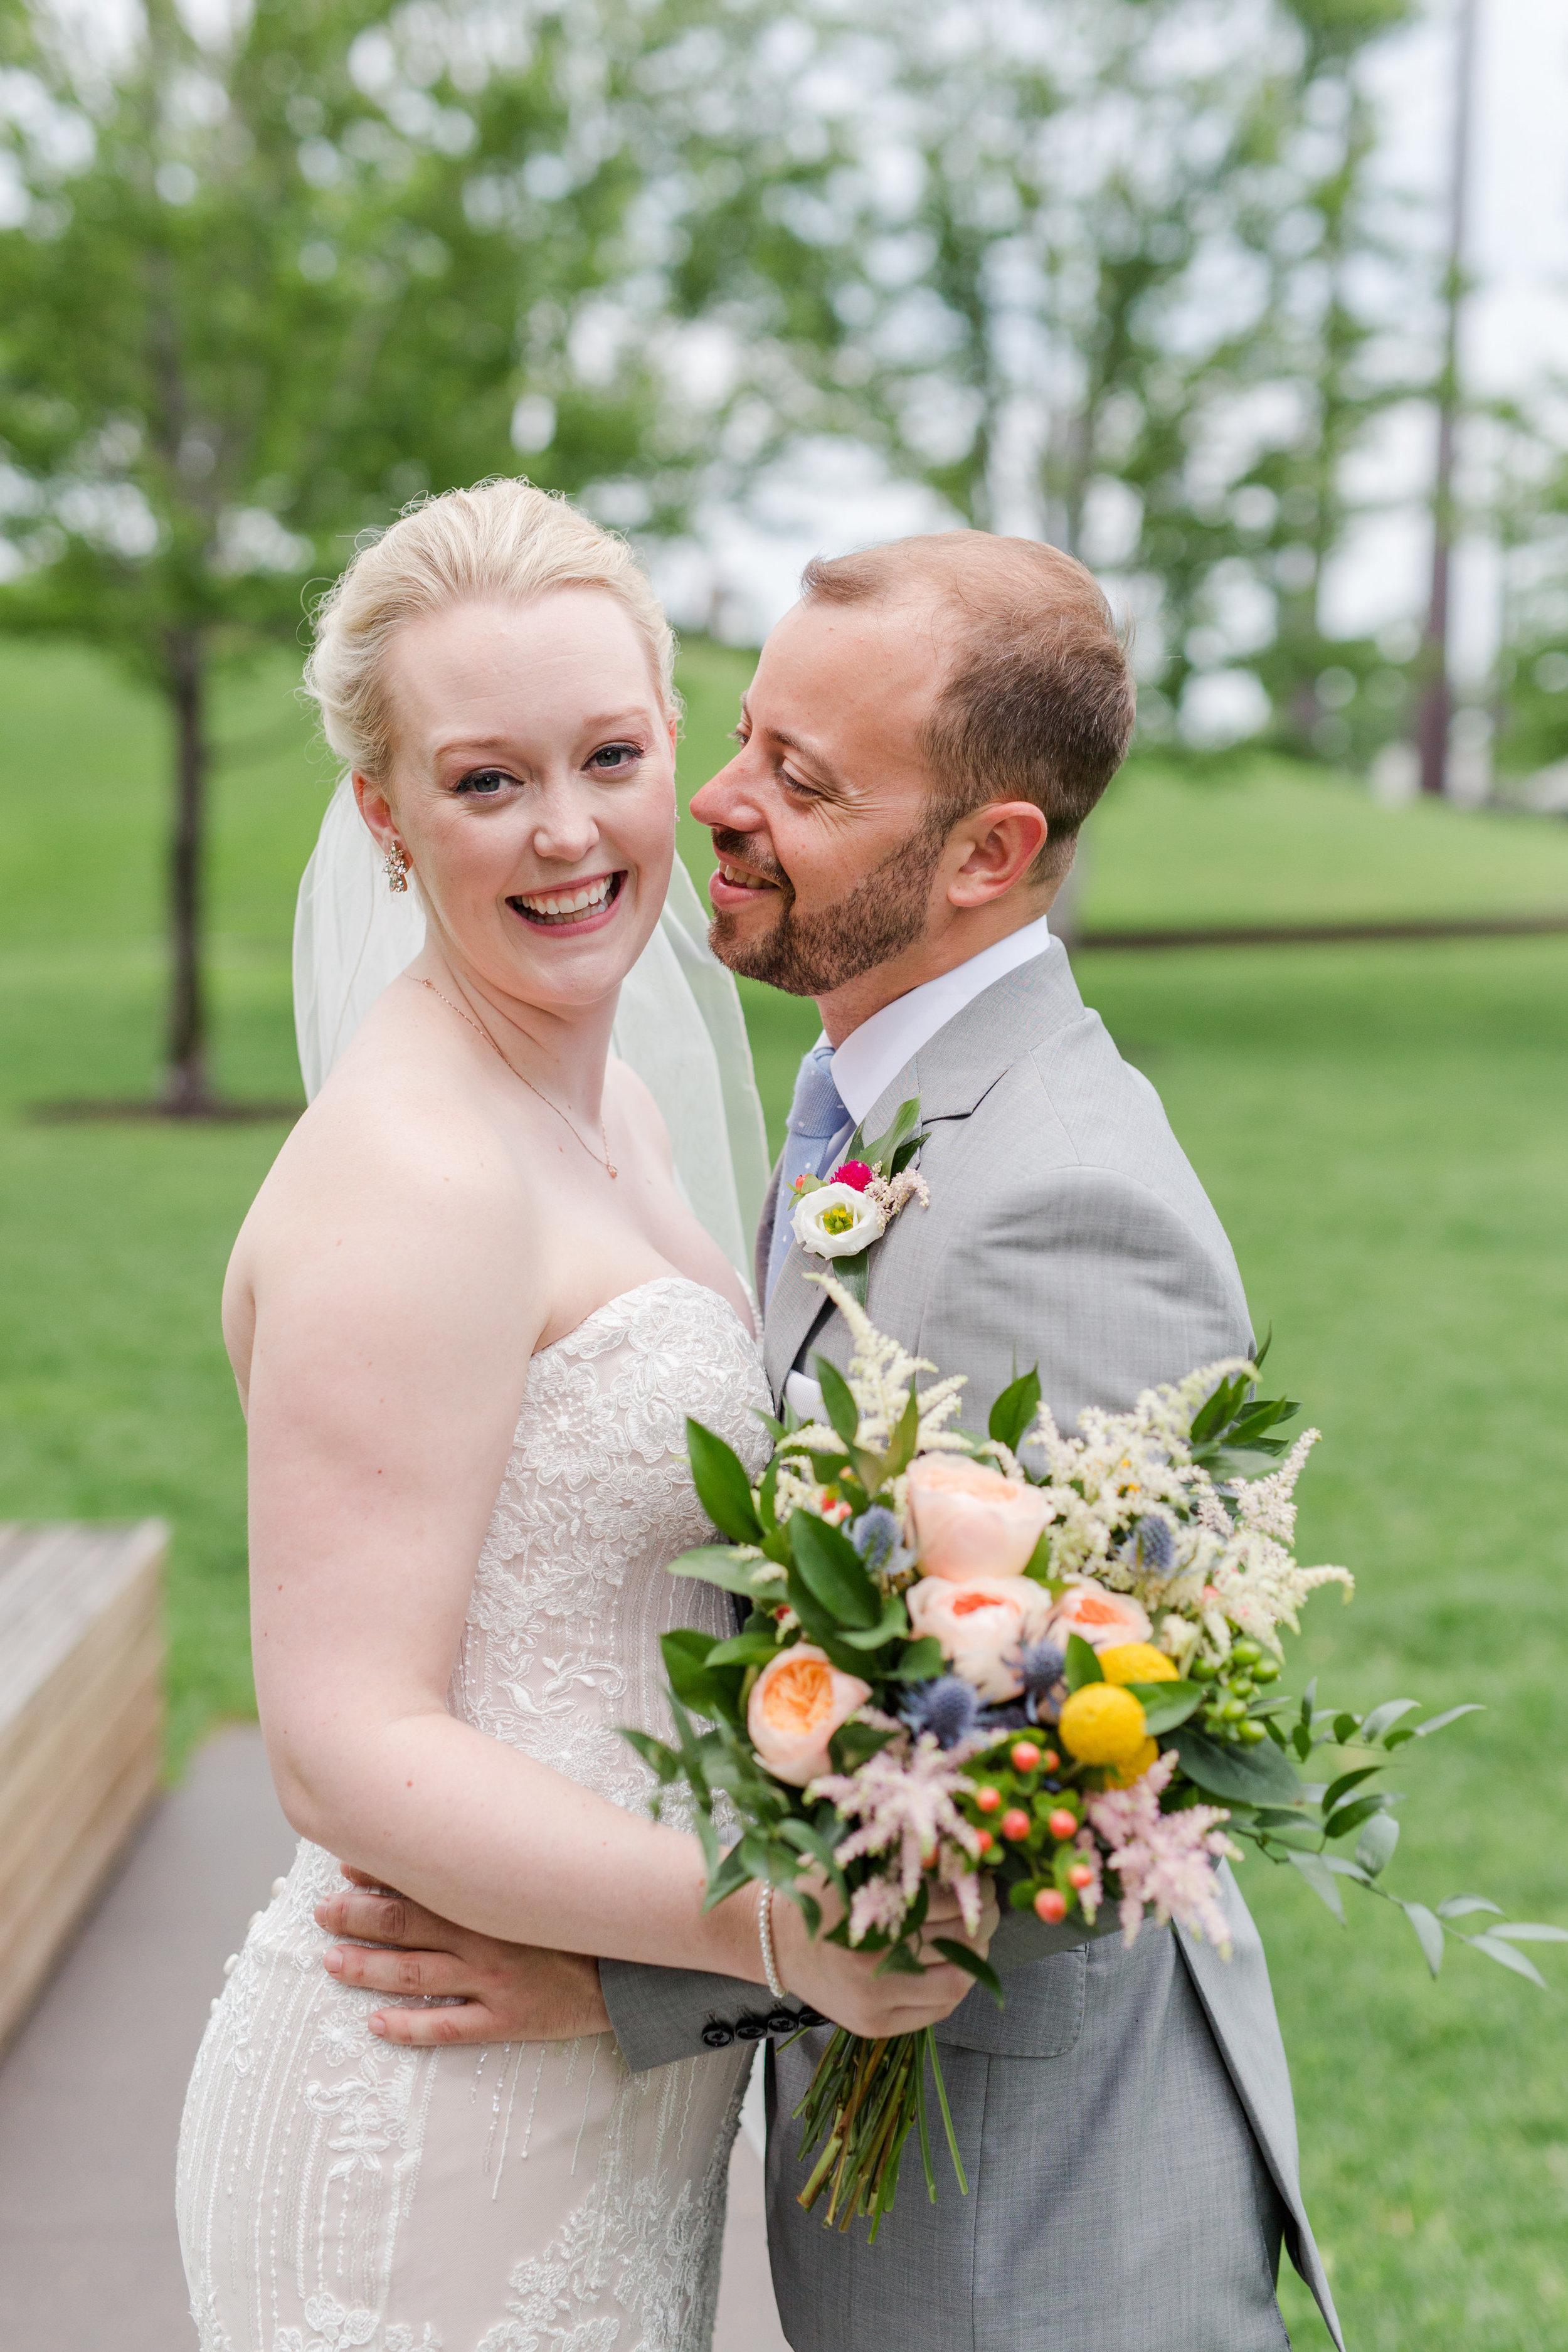 Jill + John :: Kristen Dyer :: Sixpence Events